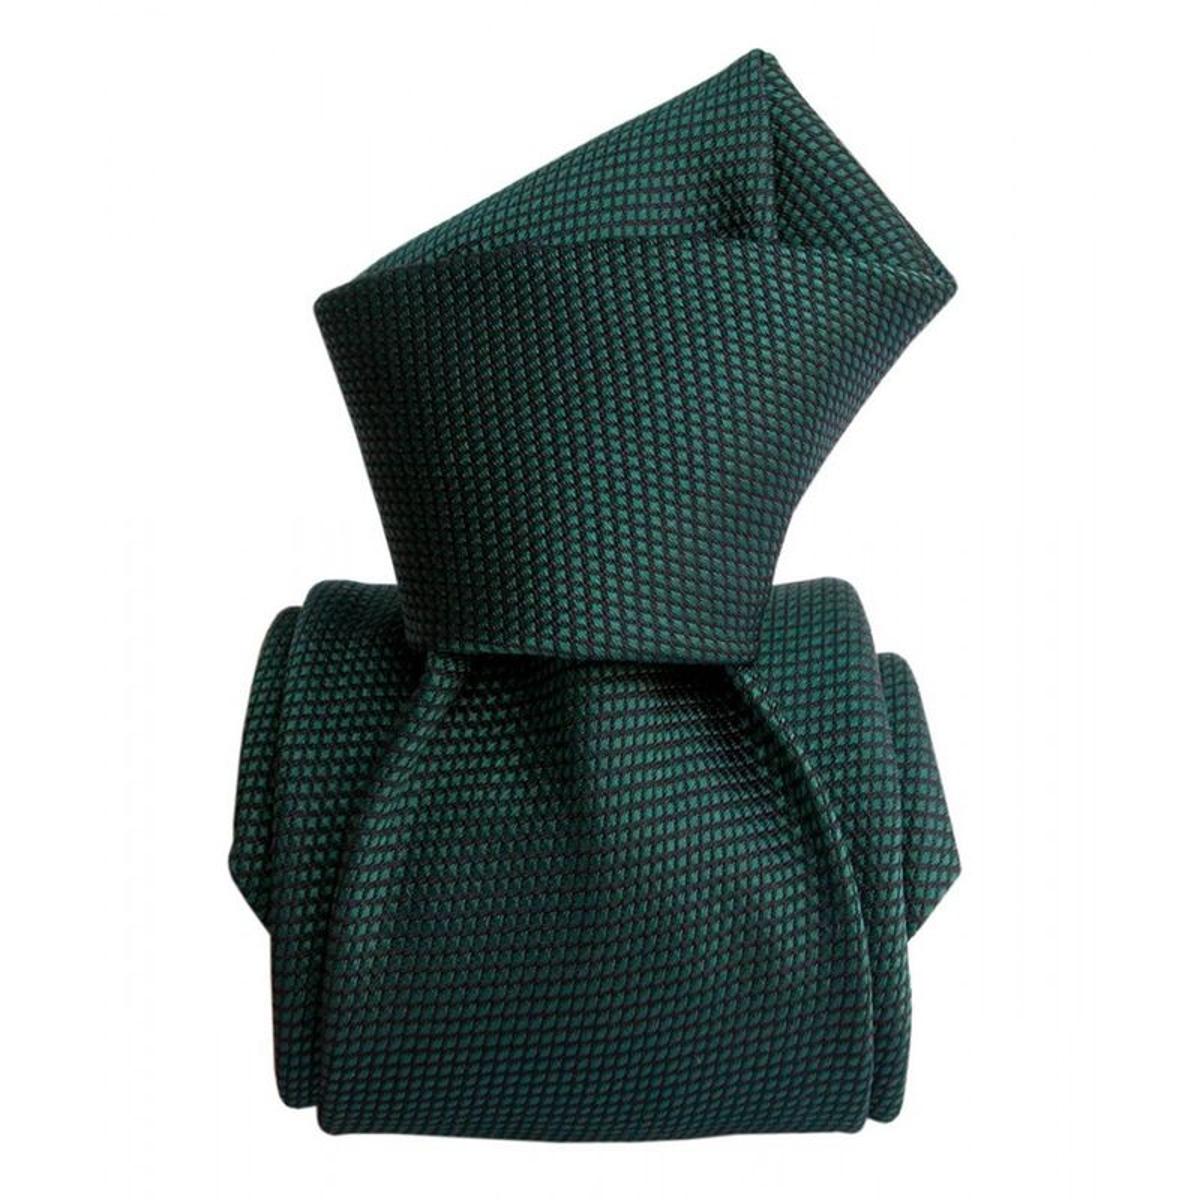 Cravate luxe soie trevise